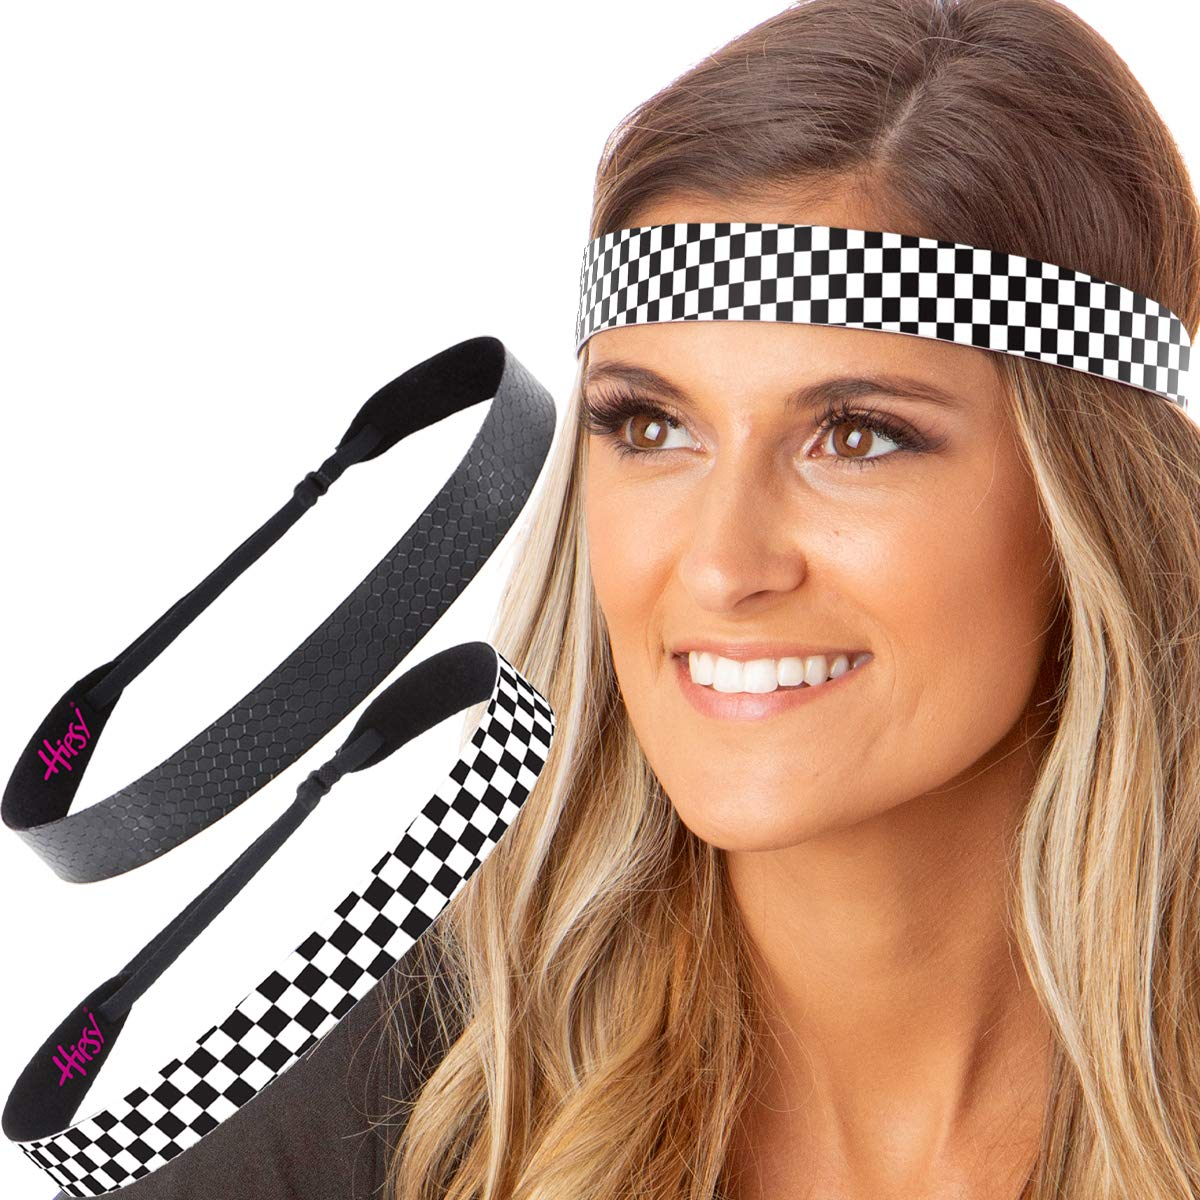 Hipsy Women's Adjustable NO SLIP Checkerboard Wide Fashion Headbands (Wide Black & Black Geo 2pk)